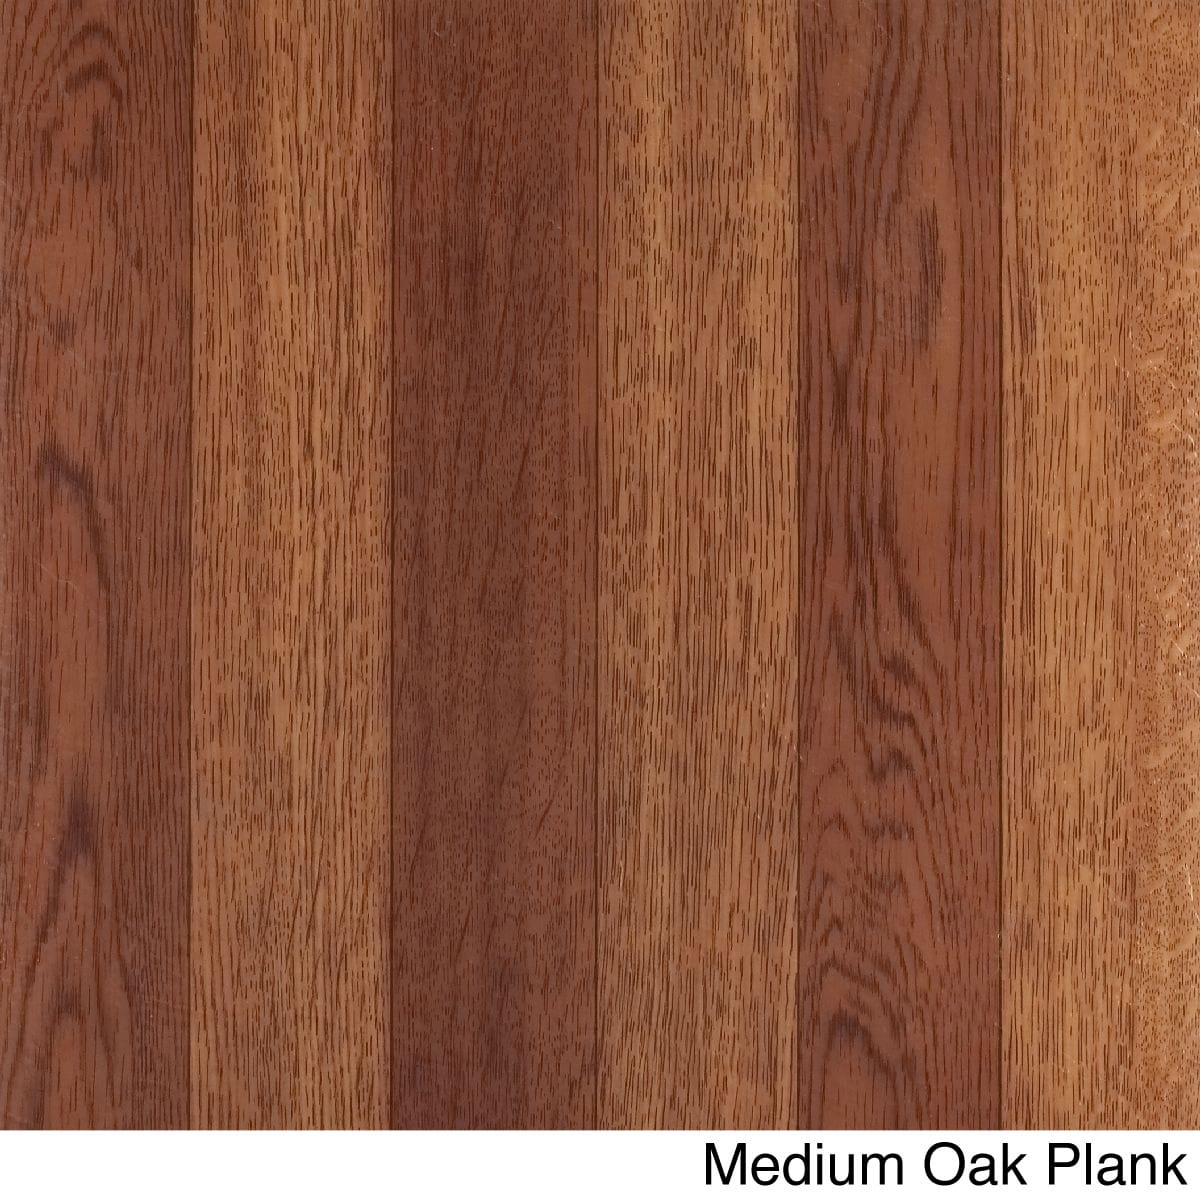 Achim nexus wood look 12x12 self adhesive vinyl floor tile 20 tiles achim nexus wood look 12x12 self adhesive vinyl floor tile 20 tiles free shipping on orders over 45 overstock 15774759 dailygadgetfo Choice Image